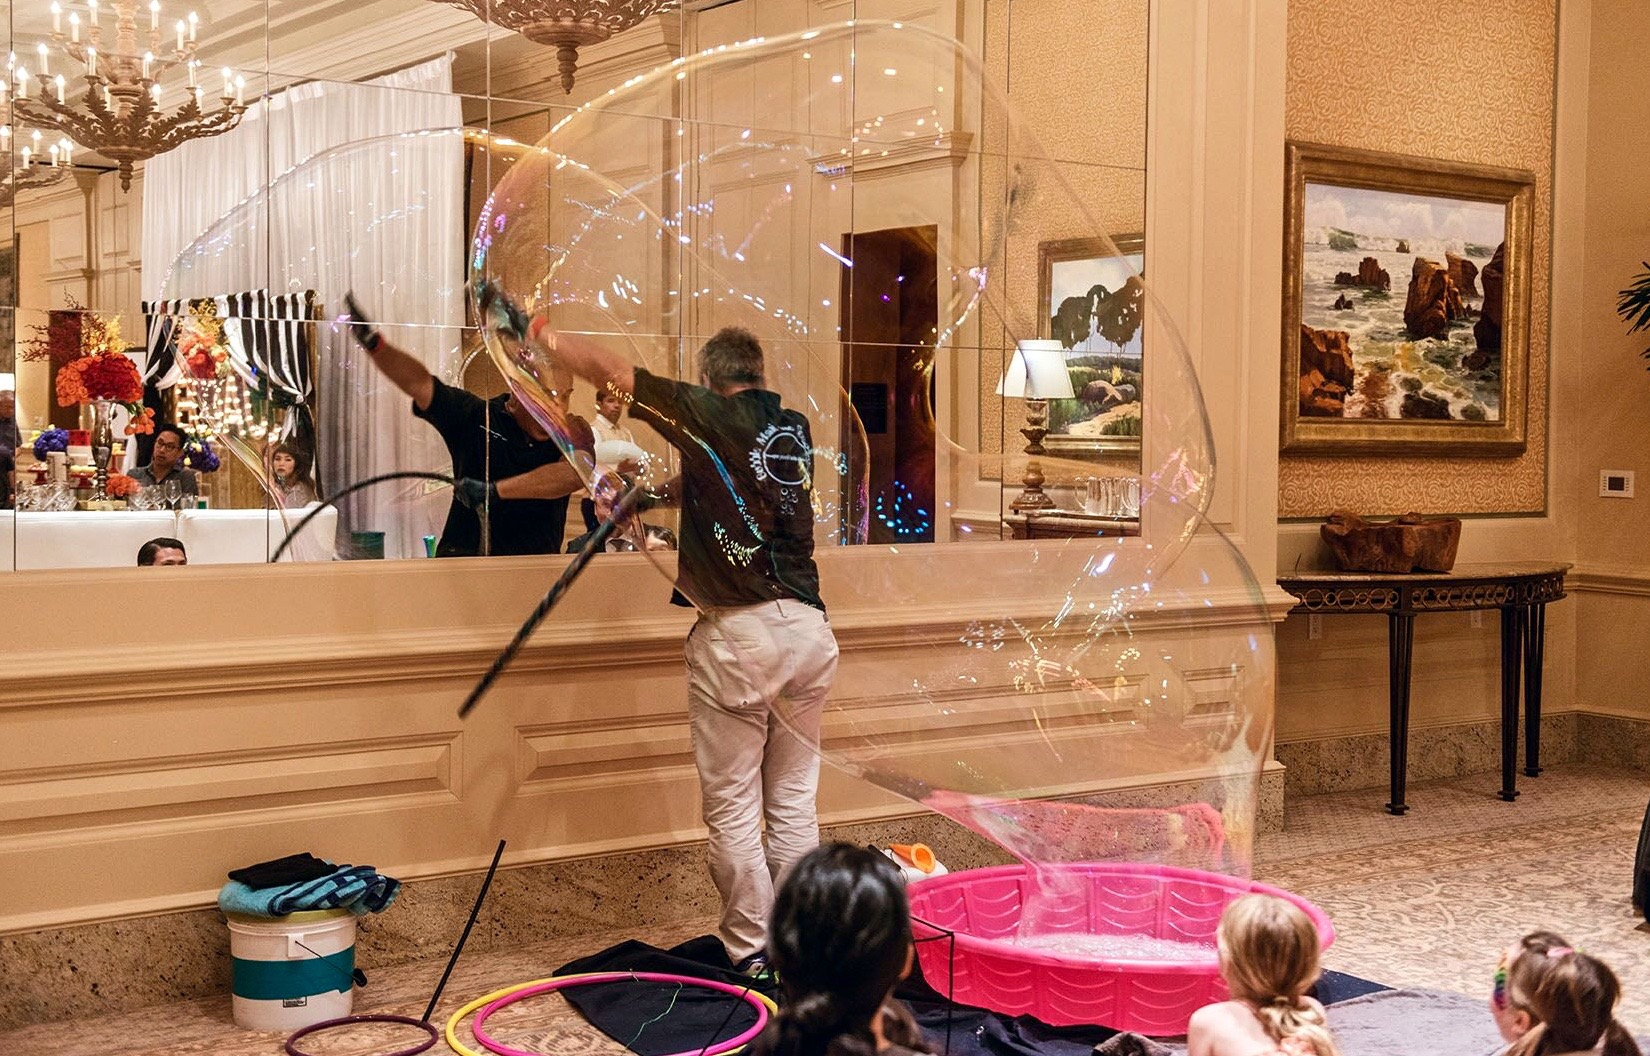 jilber doing big bubble at party.jpg